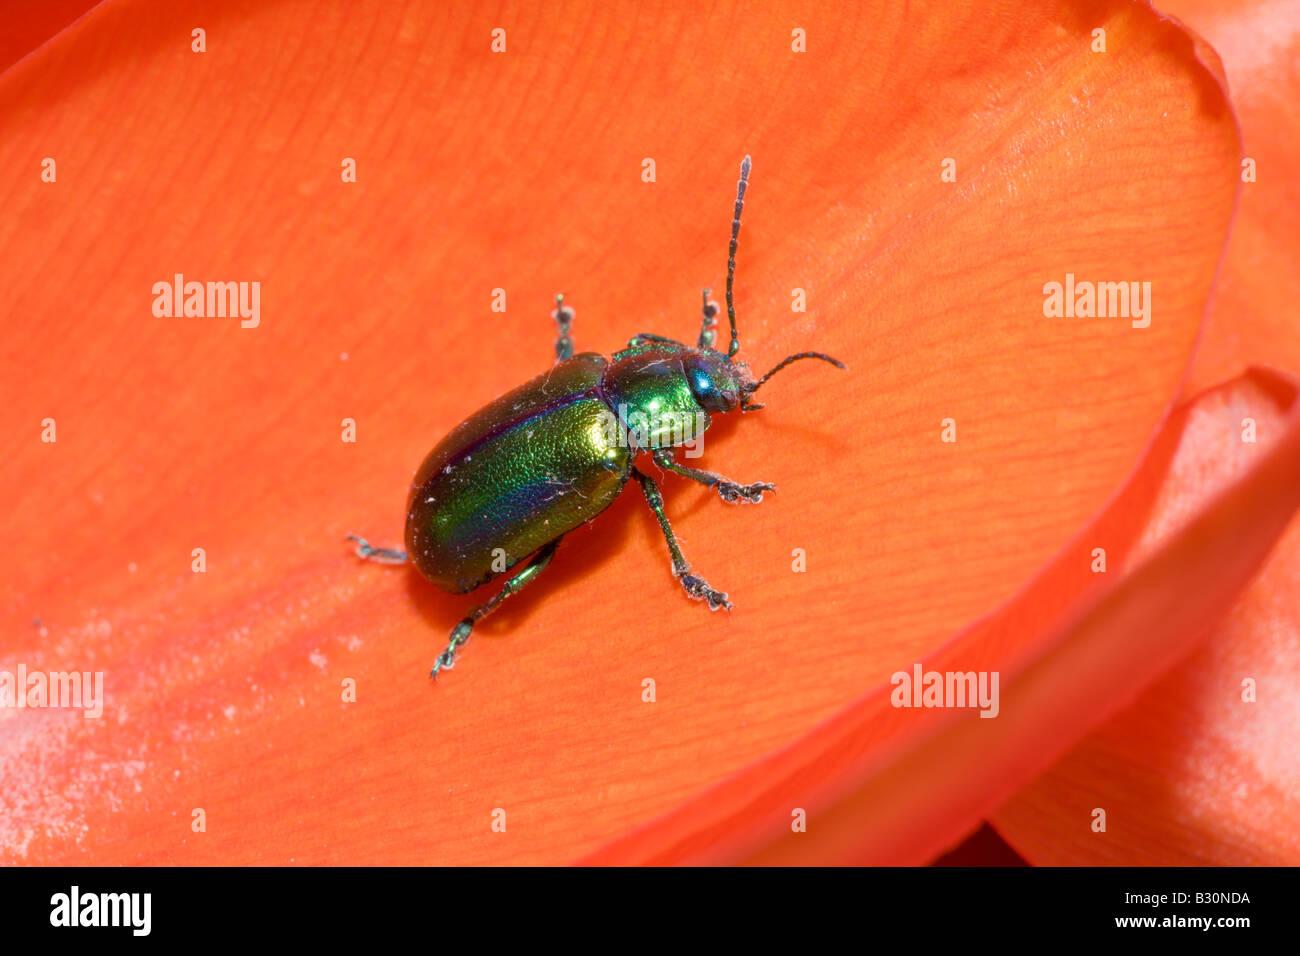 Leaf Beetle on red Tulip Chrysomela Germany Munich Bavaria - Stock Image